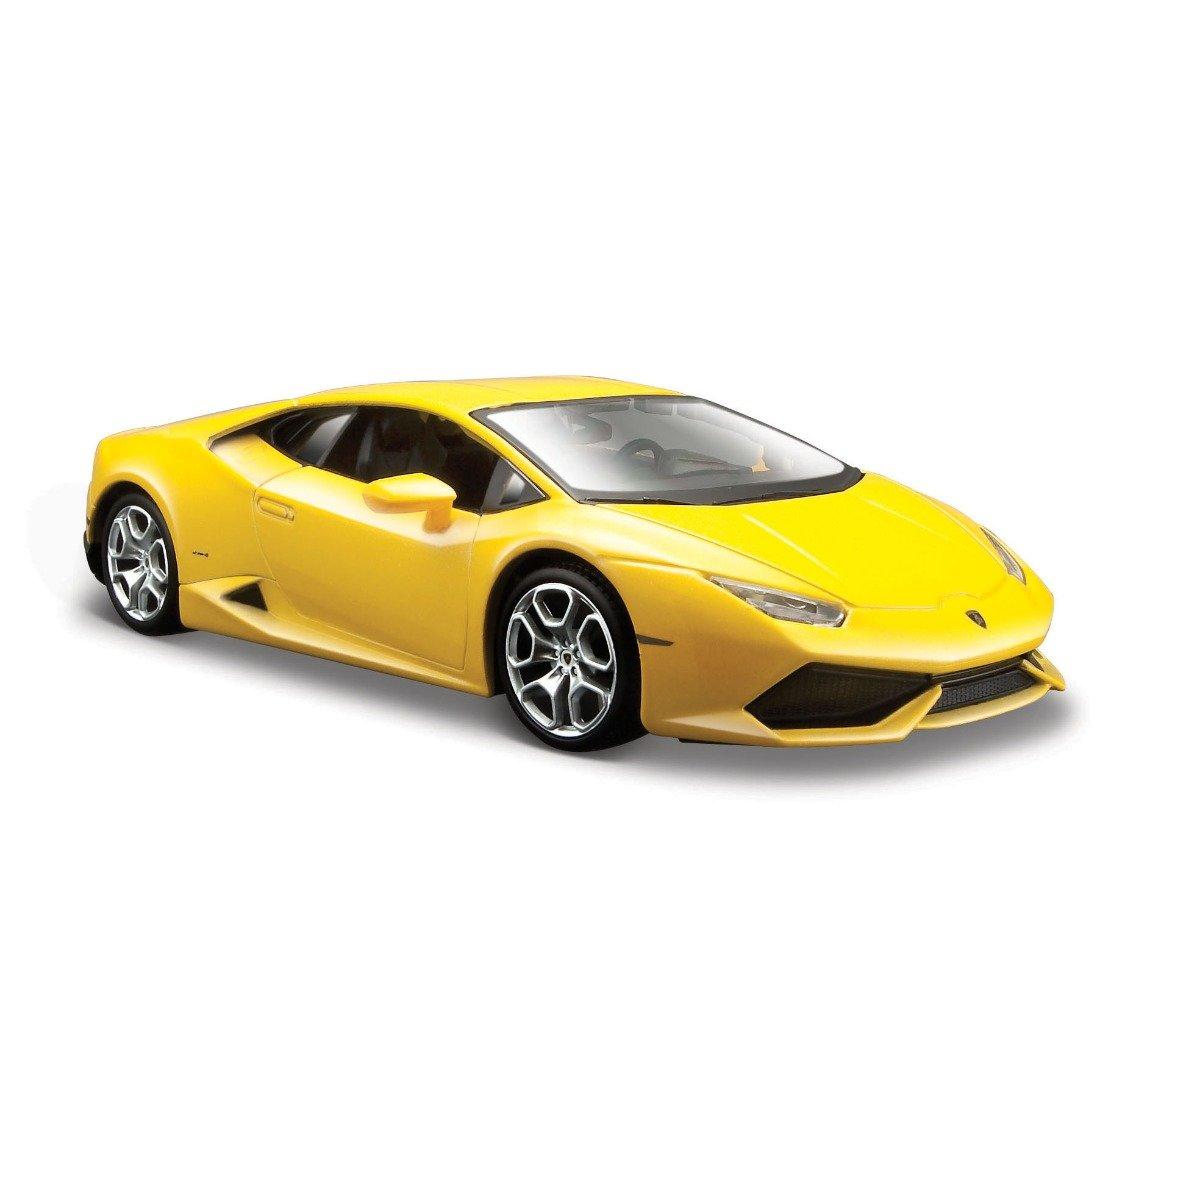 Masinuta Maisto Lamborghini Huracan LP 610-4,1:24, Galben